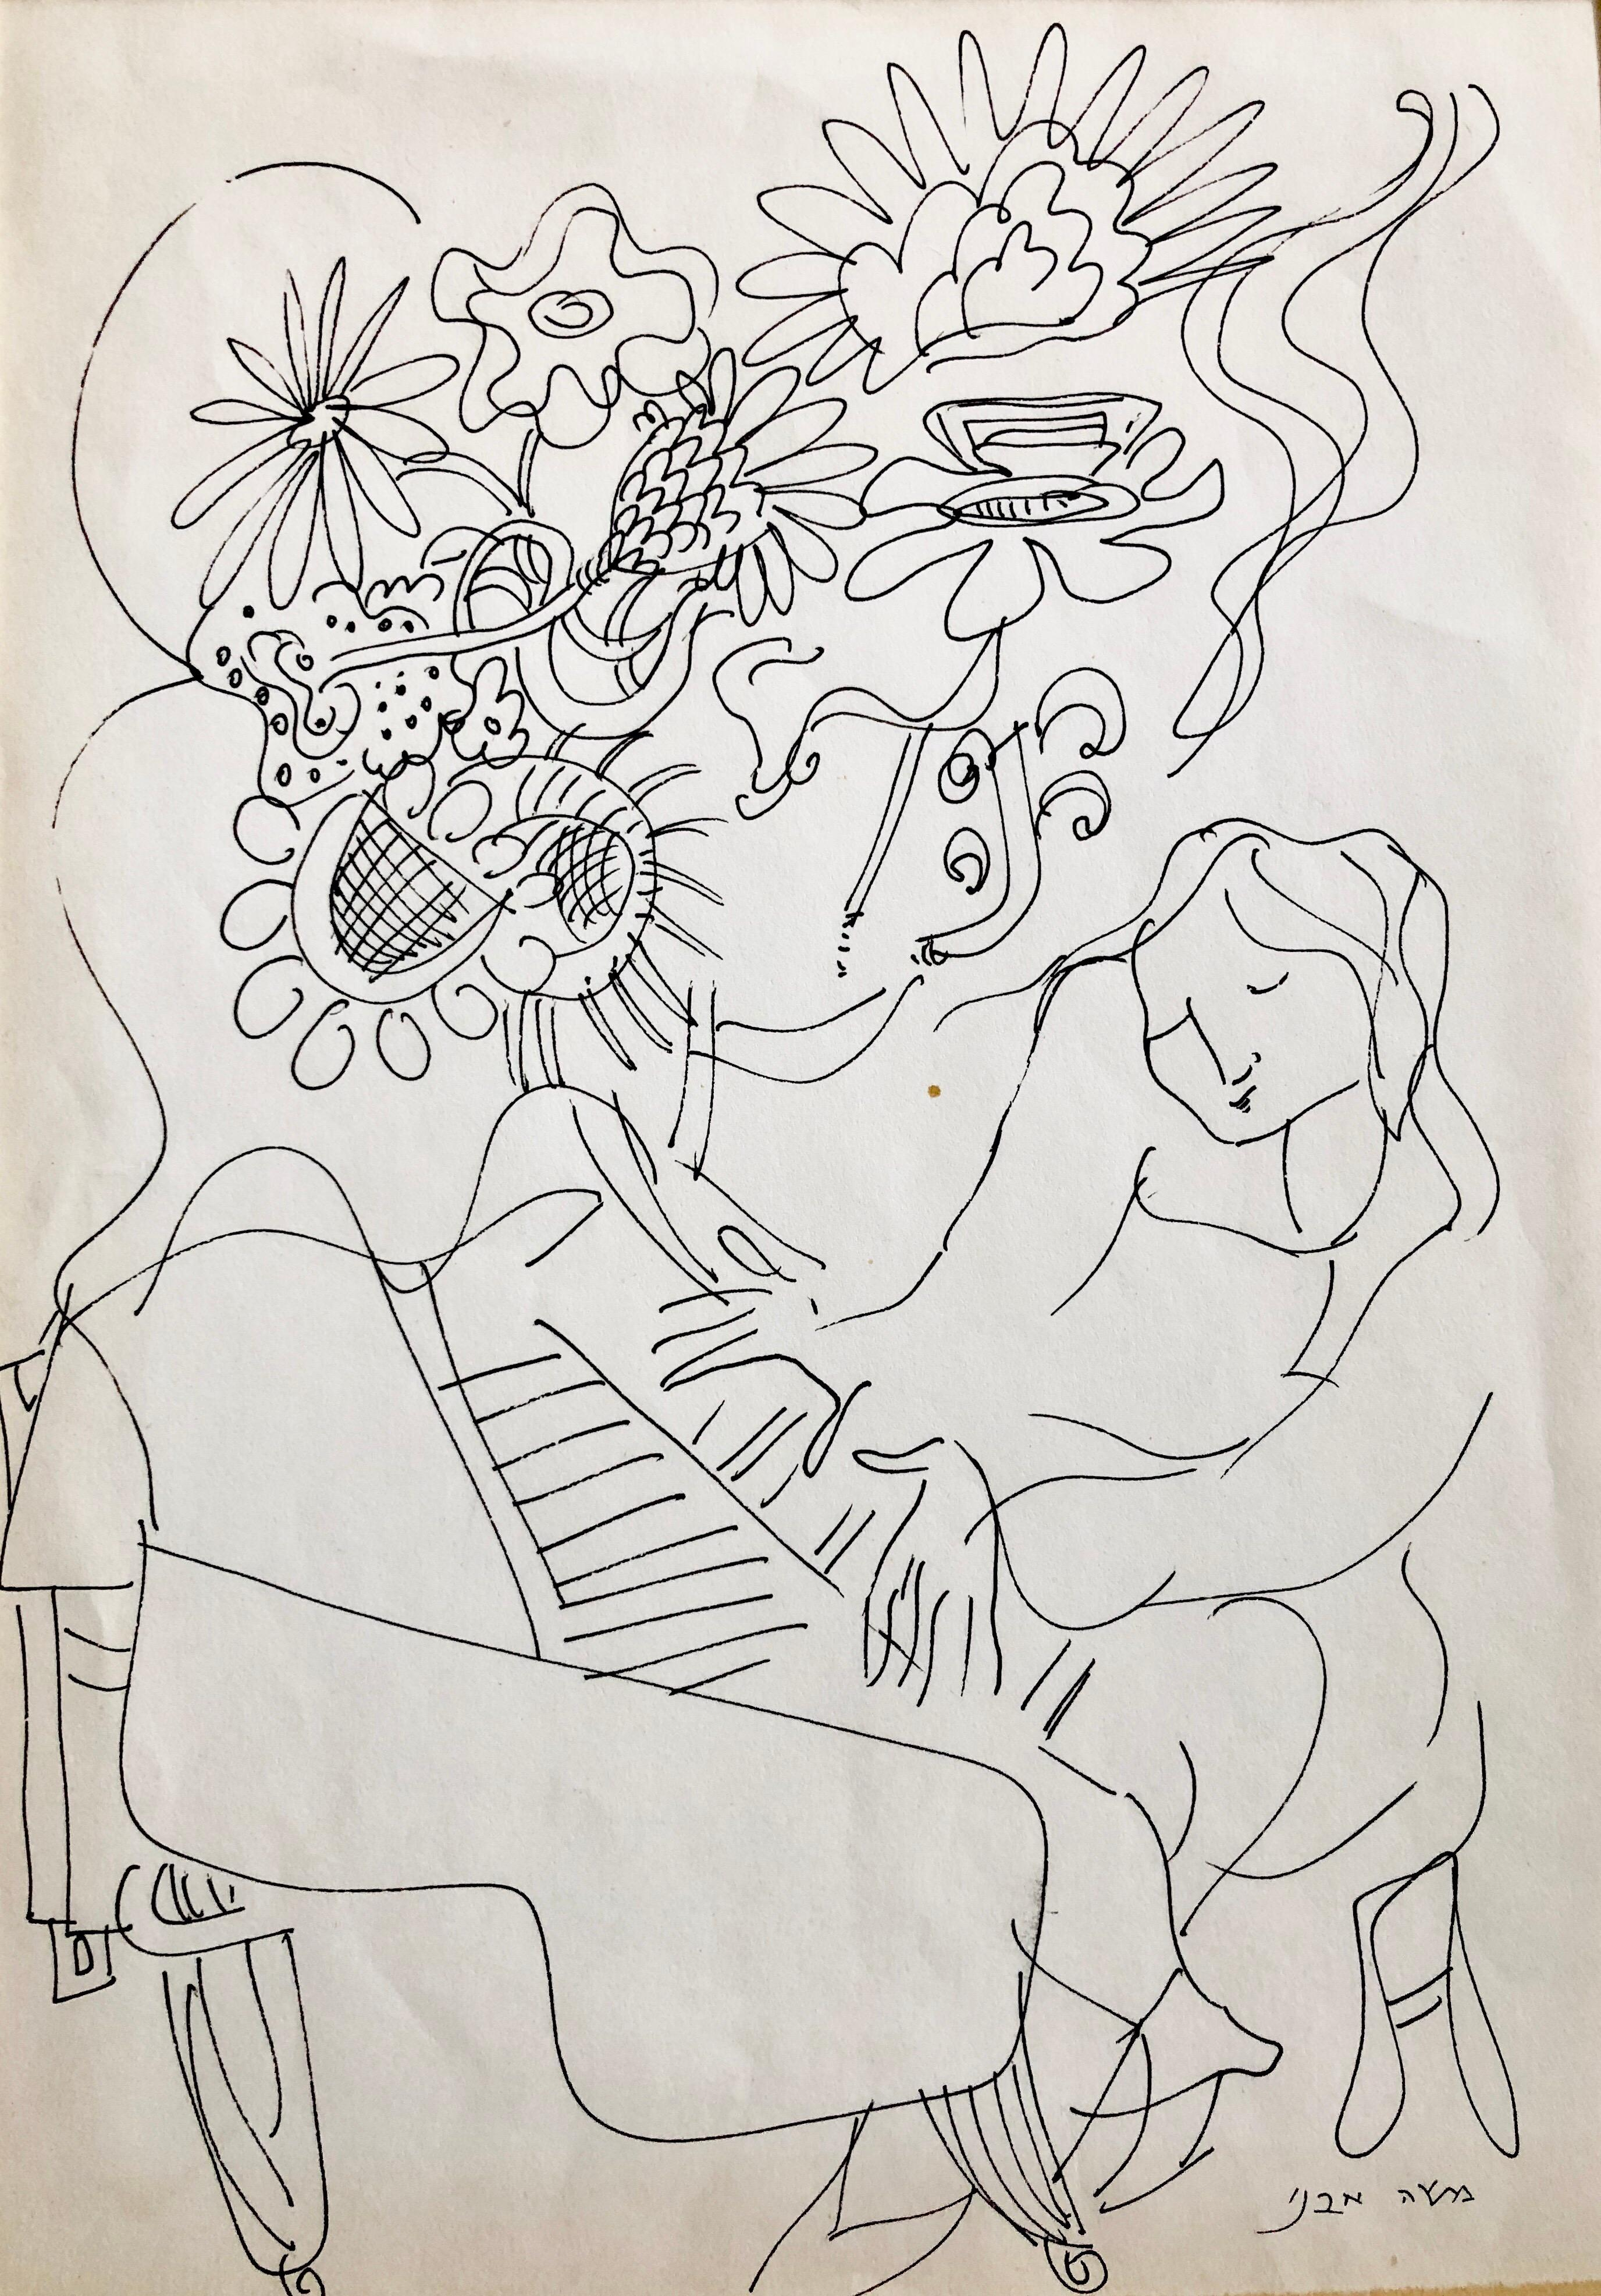 Vintage Israeli Bezalel School Drawing Woman Playing Piano, Flowers Kibbutz Life